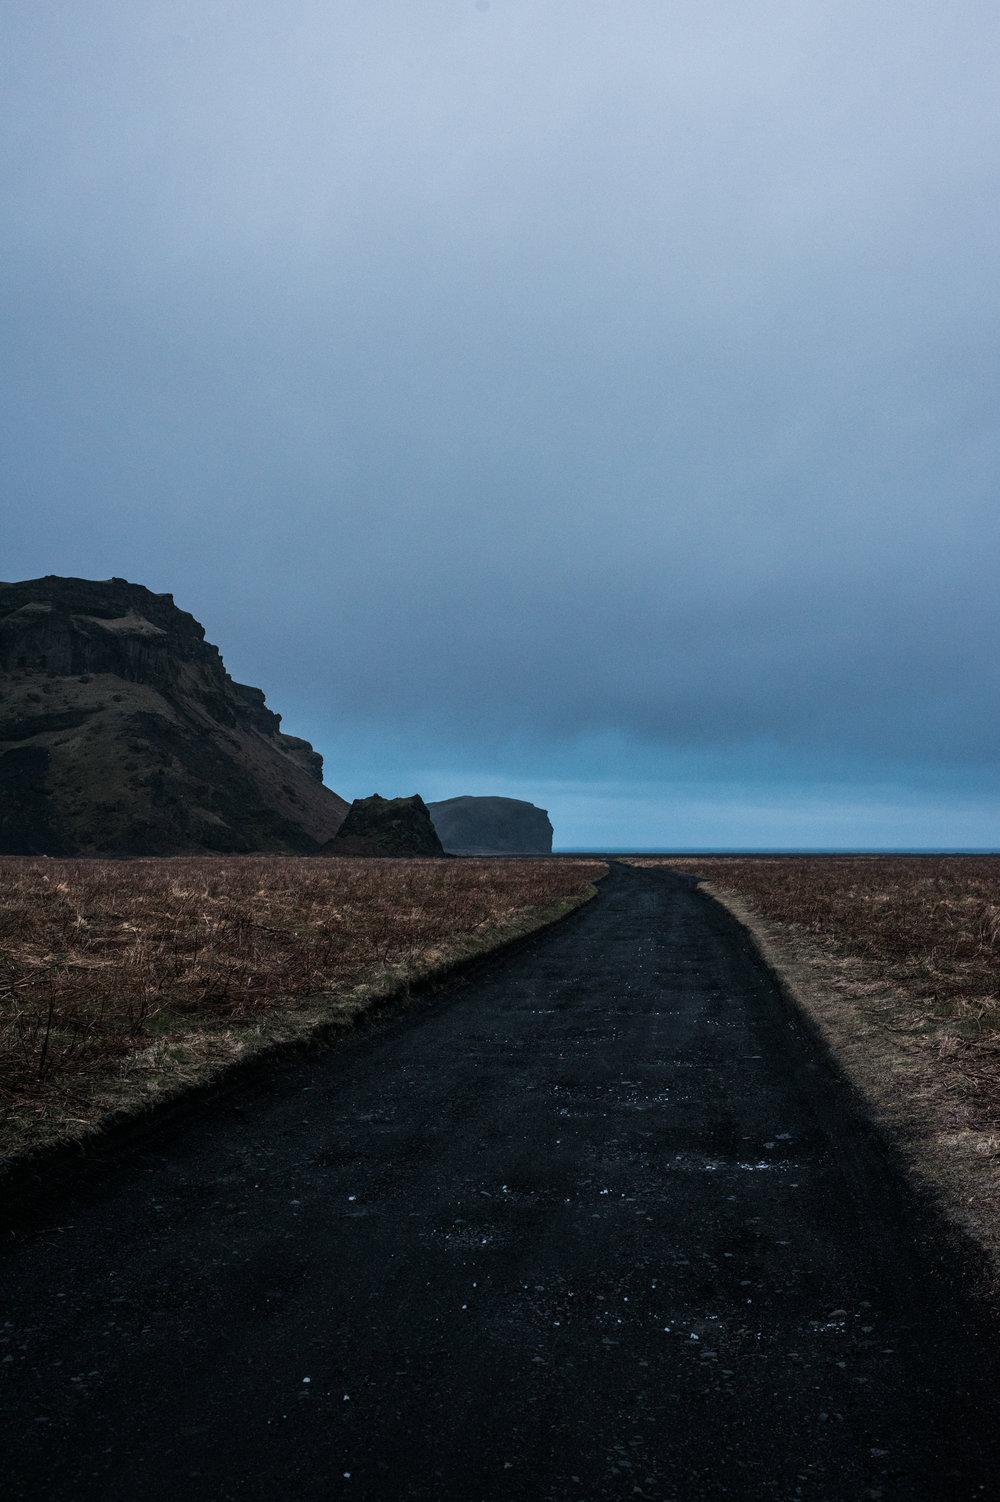 ICELAND_WOMAN_PHOTOGRAPHER_TARASHUPE_OUTDOOR_PHOTOGRAPHY_129.jpg